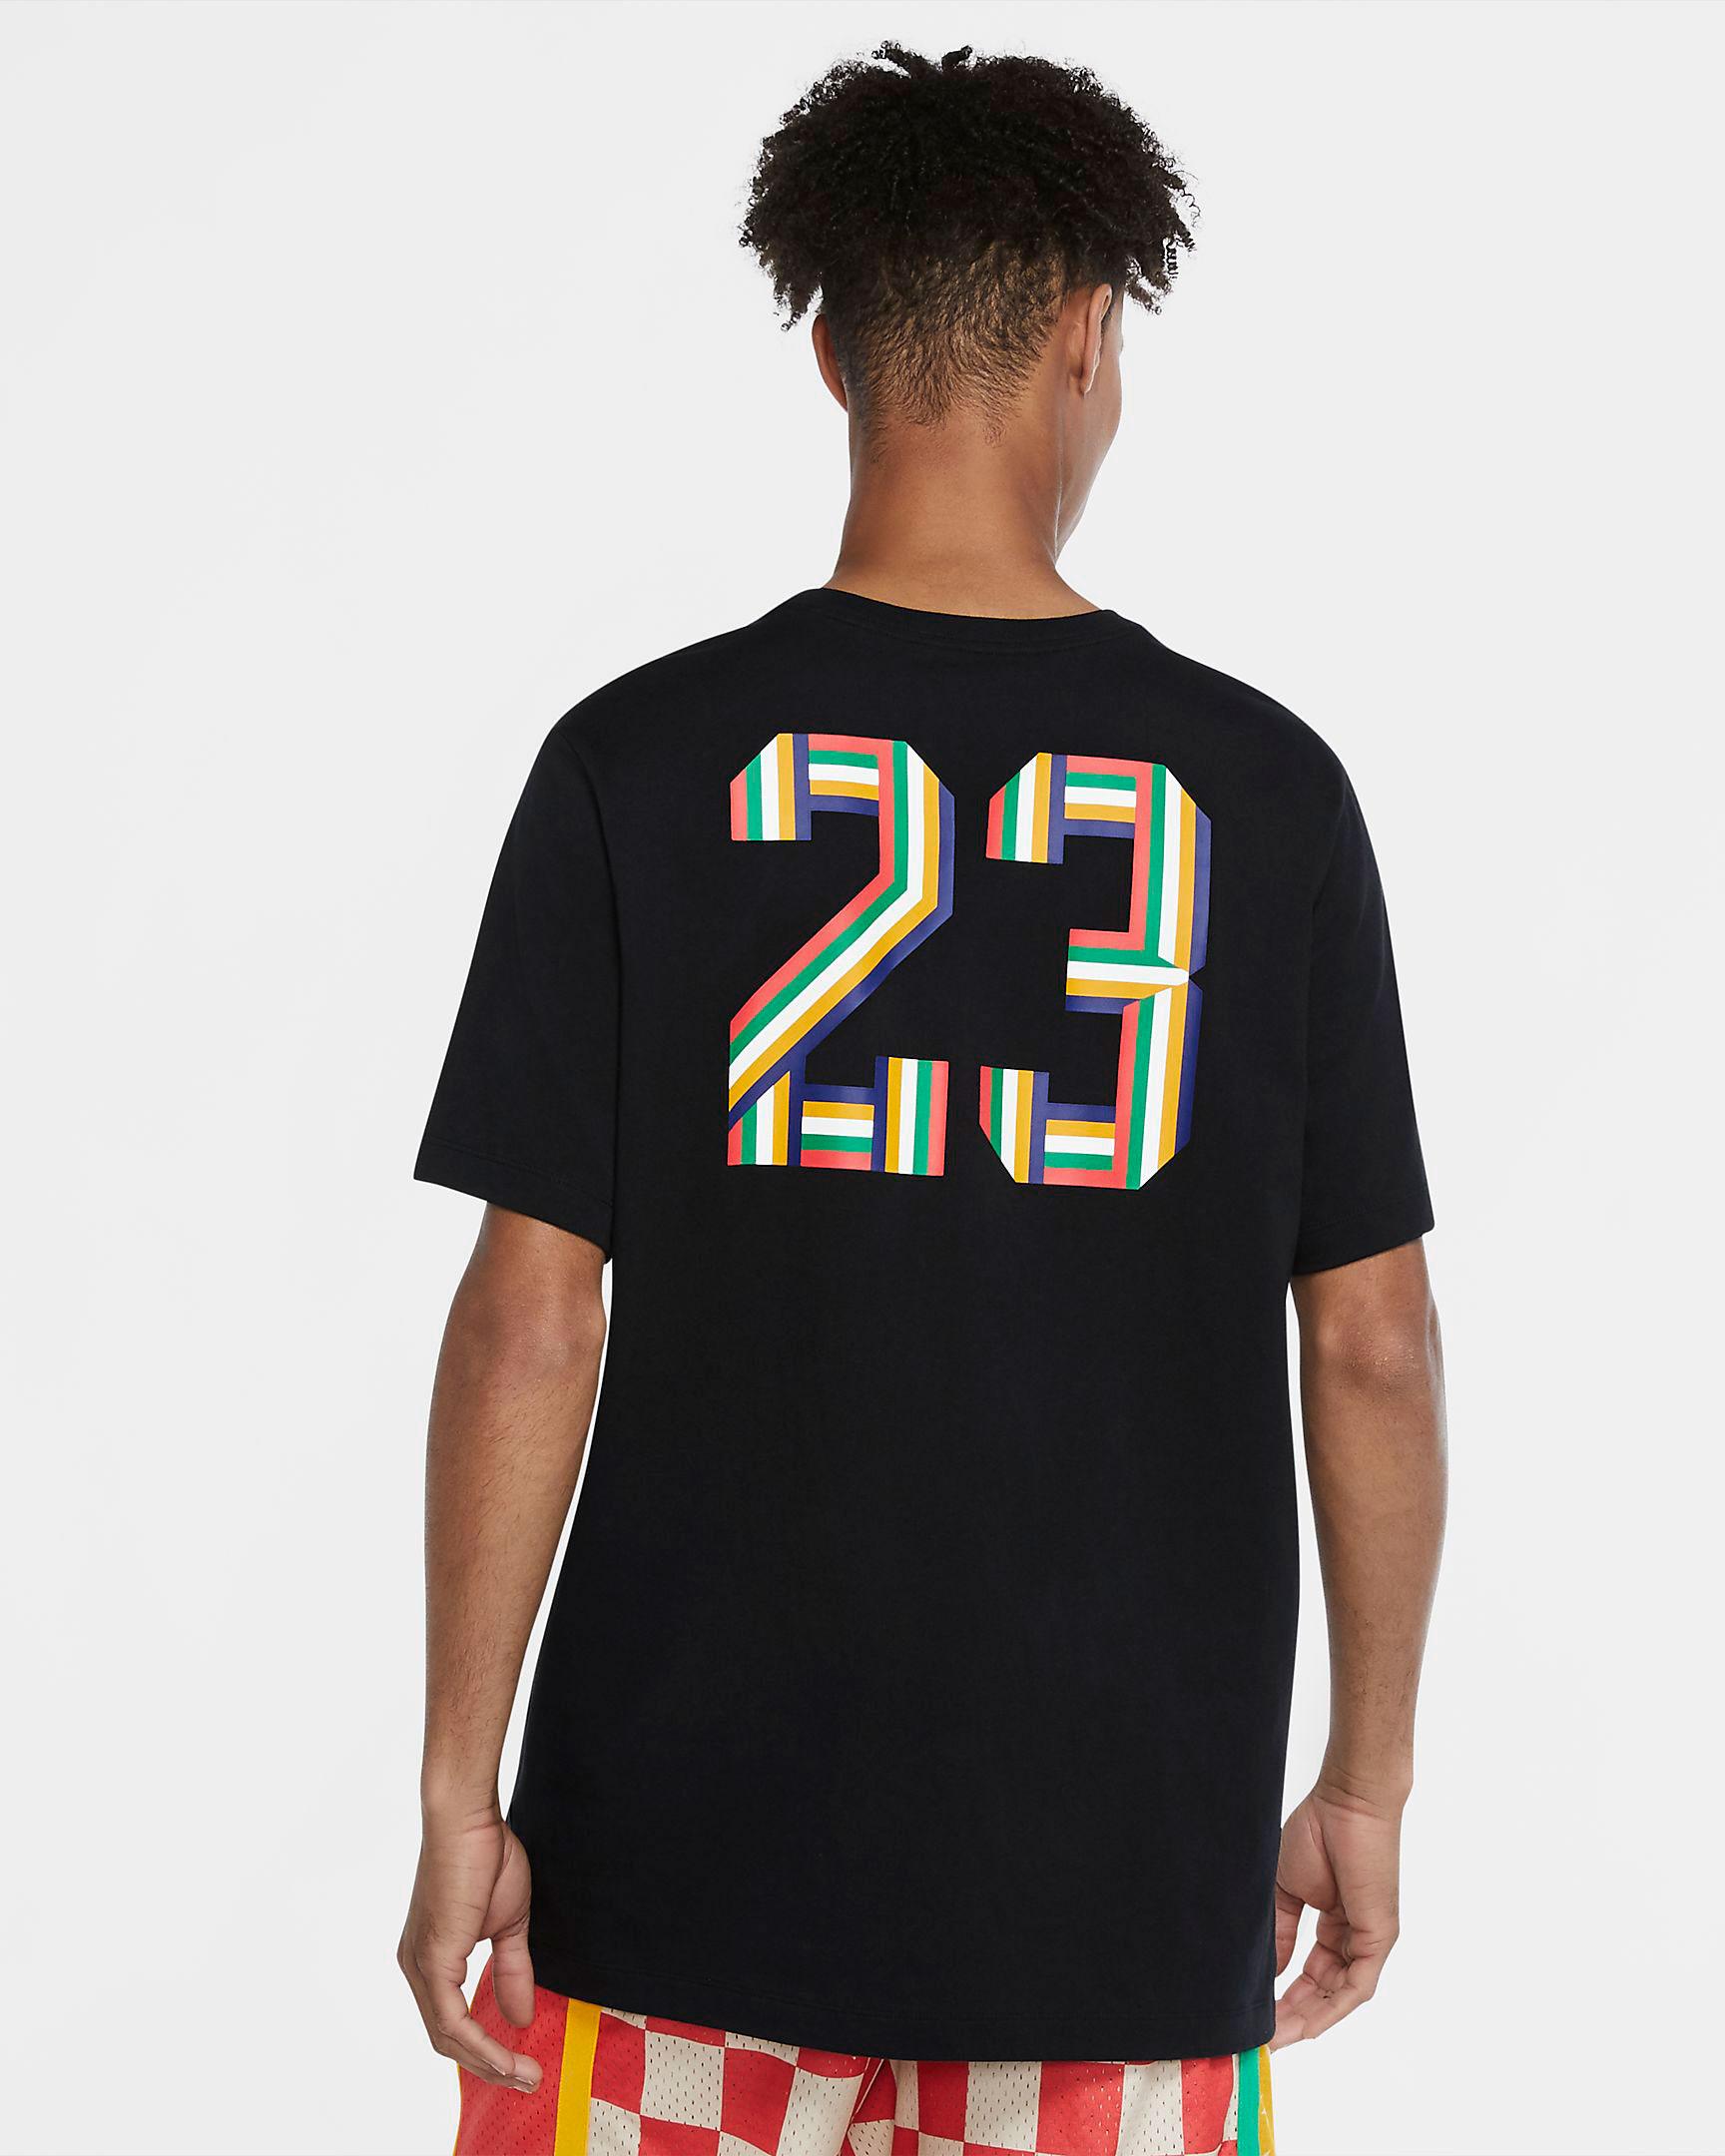 jordan-sport-dna-jumpman-shirt-black-multi-color-2